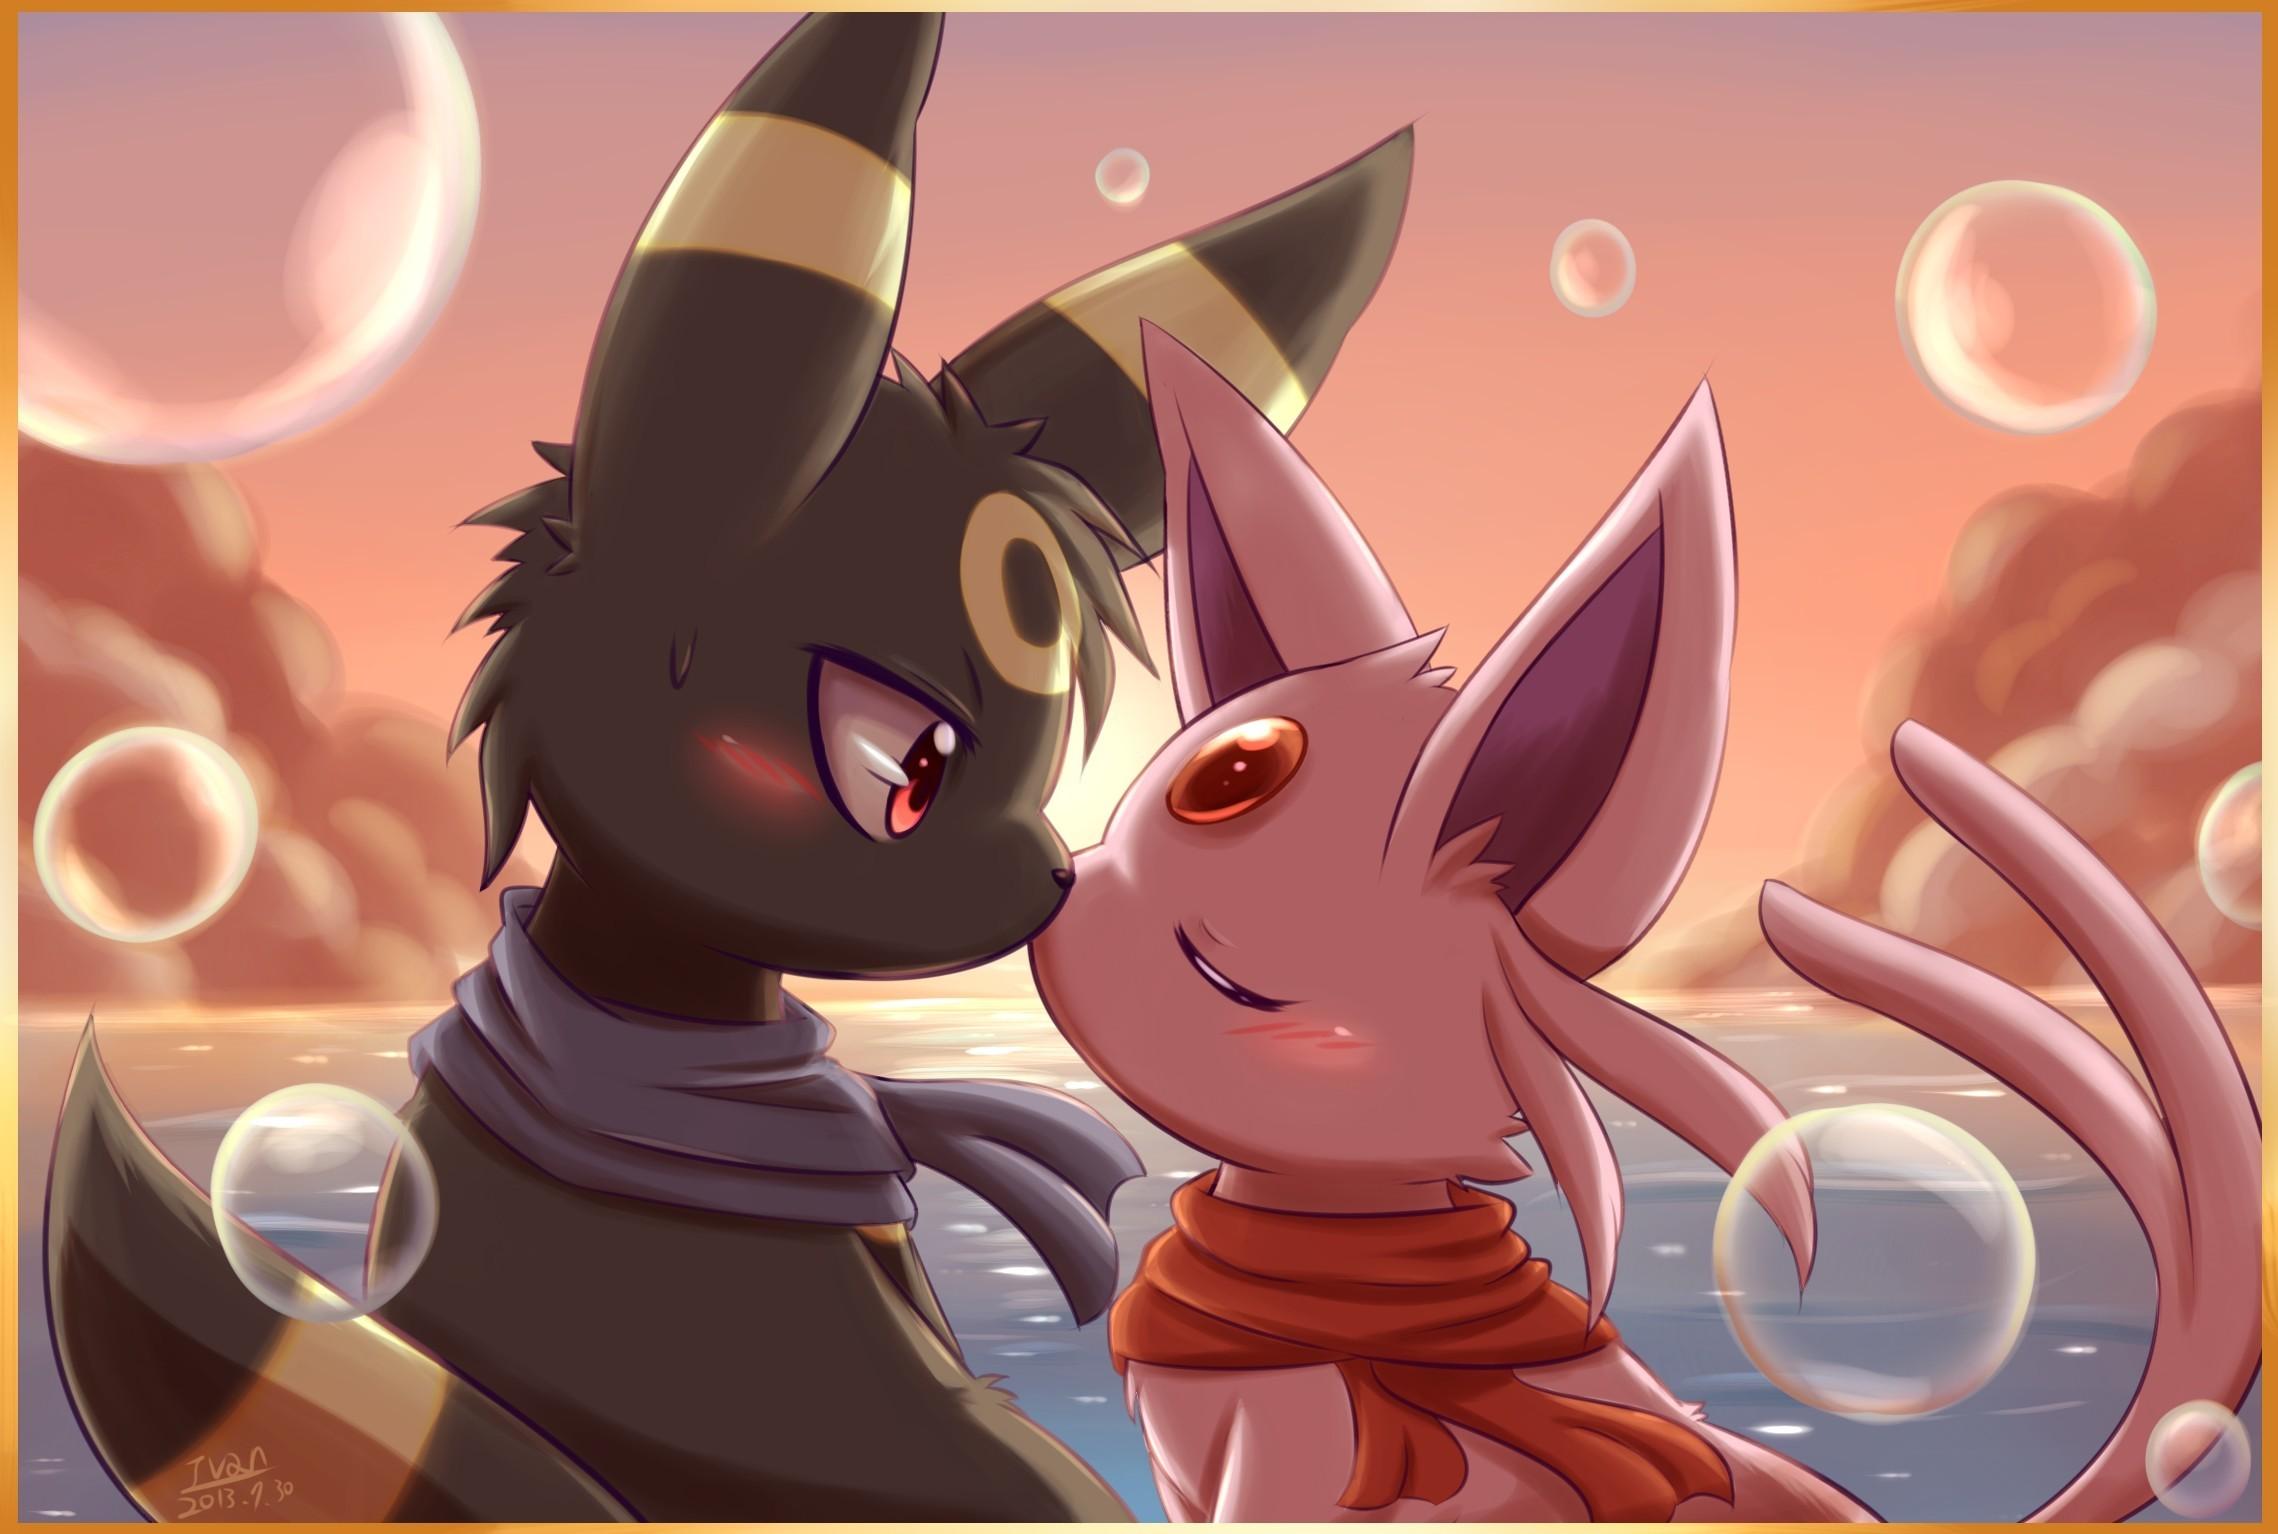 Res: 2278x1534, 2560x1440 1920x1200 Pokemon Entei Suicune Raikou Celebi Zoroark Zorua  wallpaper | 1920x1200 | 191652 | WallpaperUP